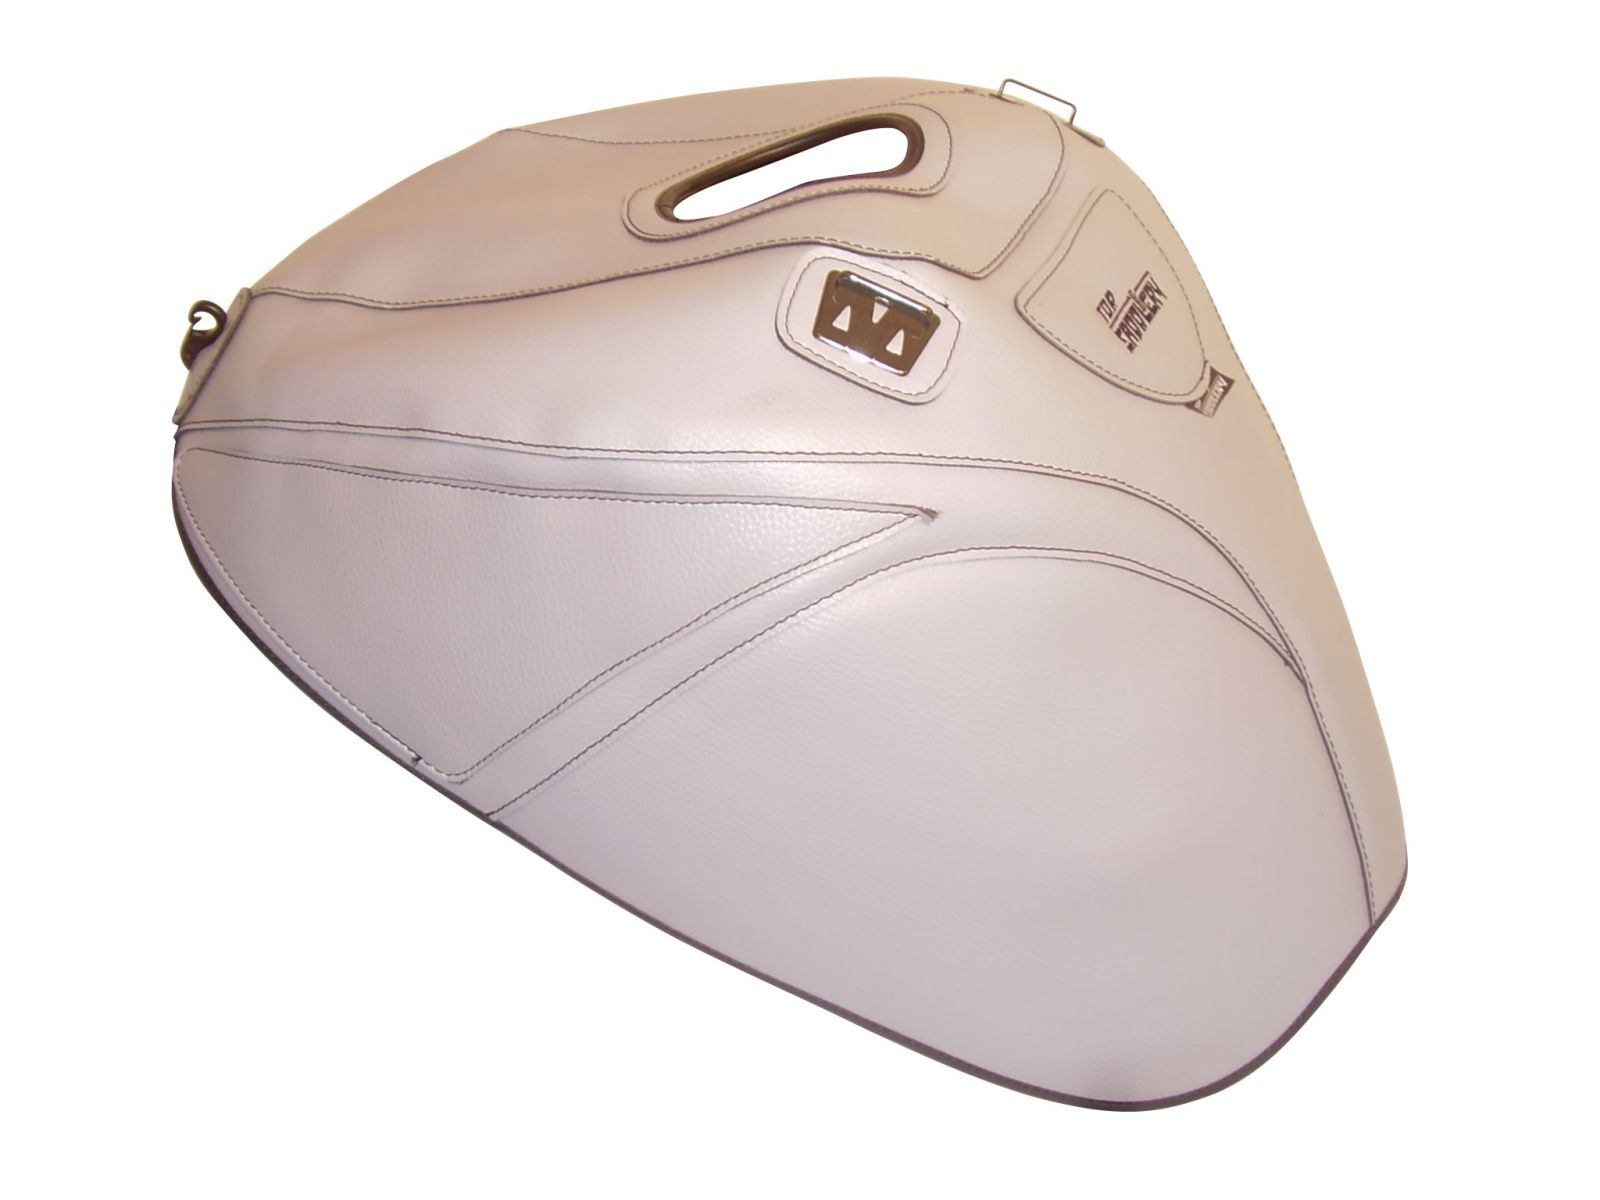 Capa de depósito TPR2397 - SUZUKI SV 1000 S/N [2003-2005]